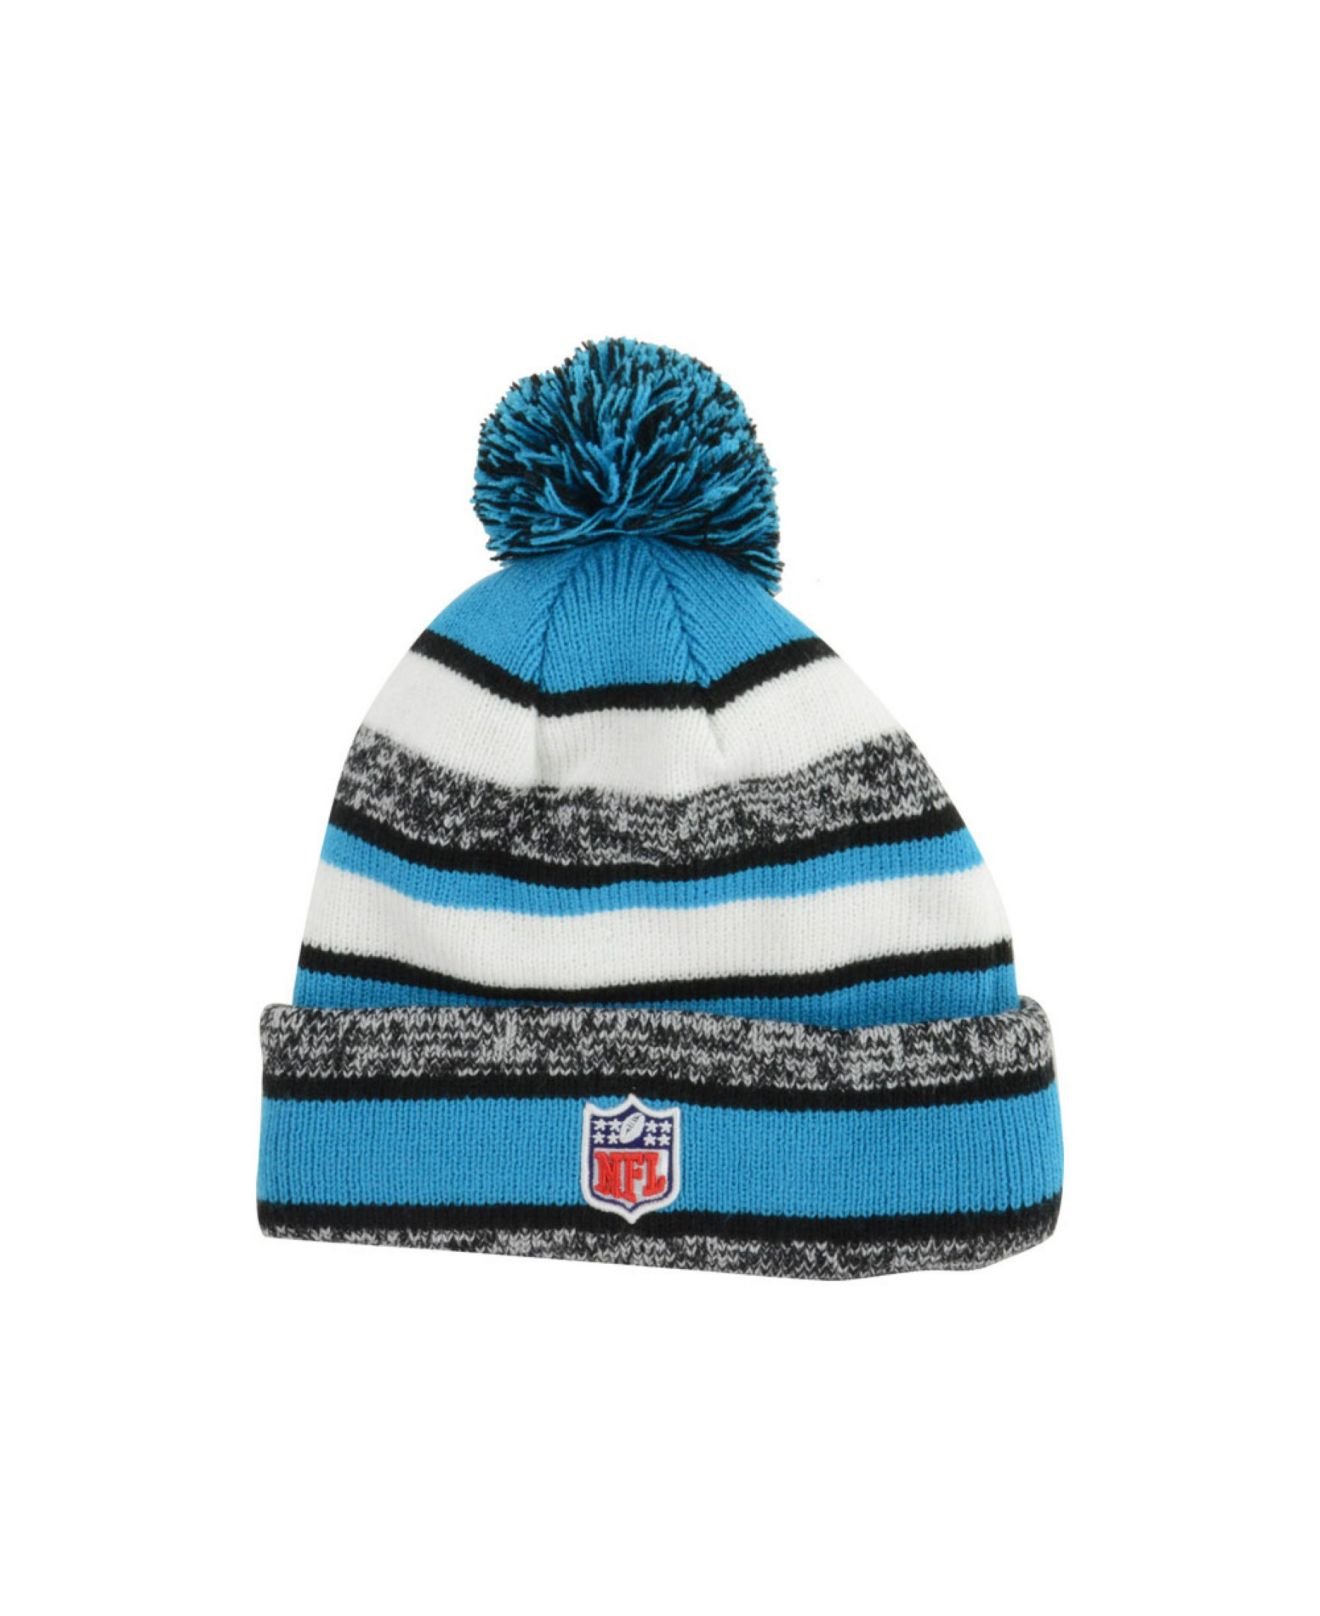 0249984a3 Lyst - KTZ Carolina Panthers Sport Knit Hat in Blue for Men